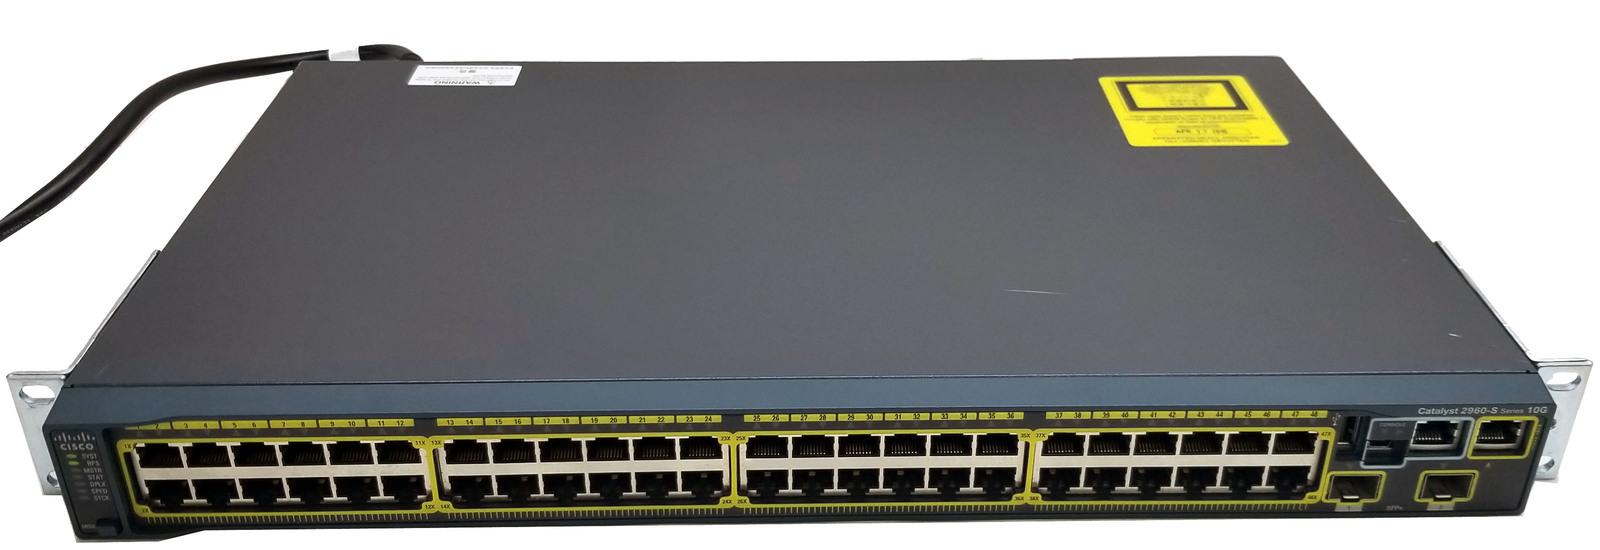 Cisco cata 2960 s 001